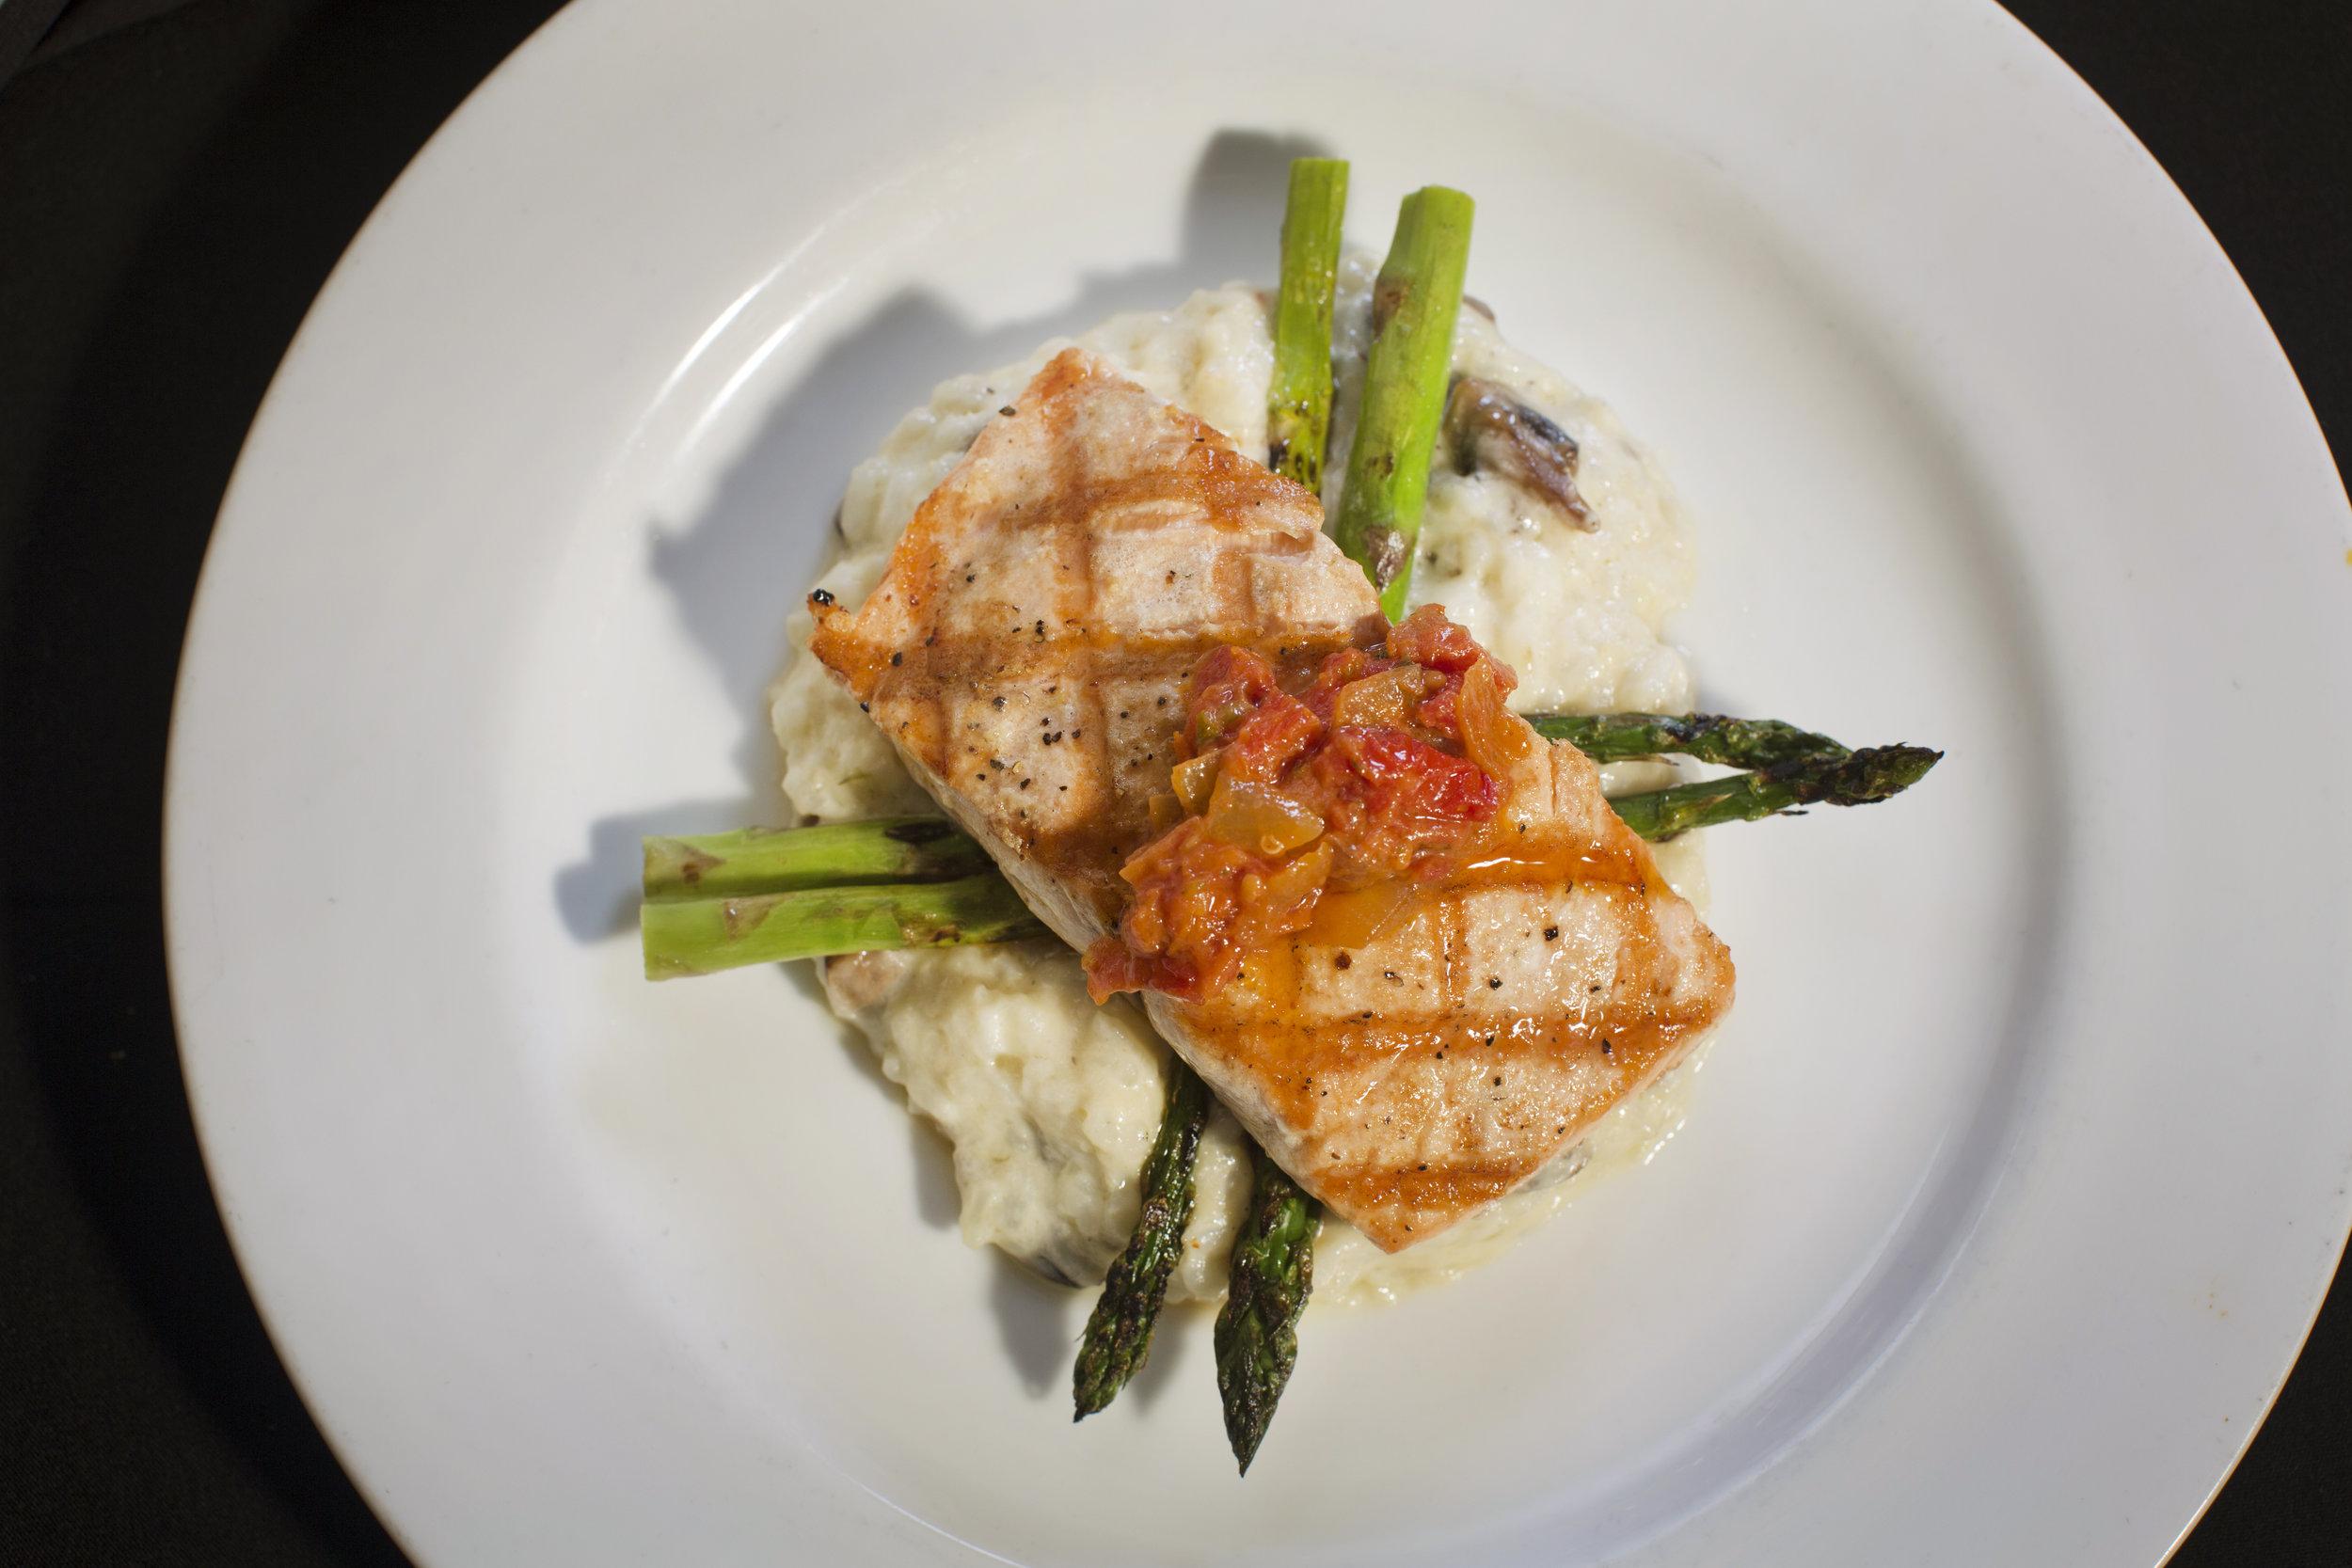 Plated Salmon dish